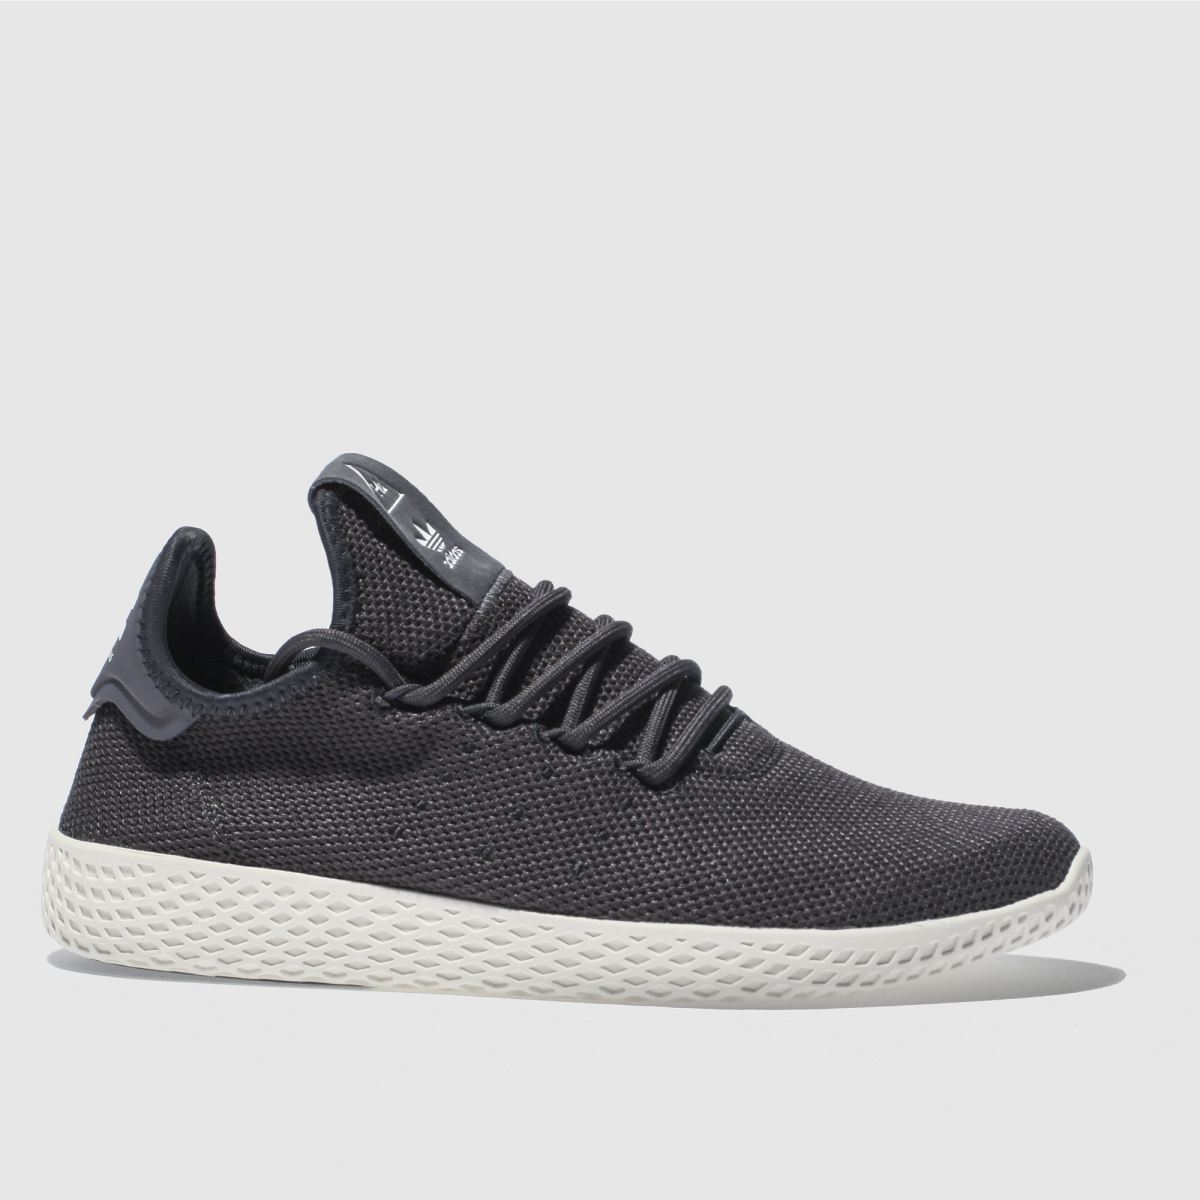 Adidas Adidas Dark Grey Pharrell Williams Tennis Hu Trainers